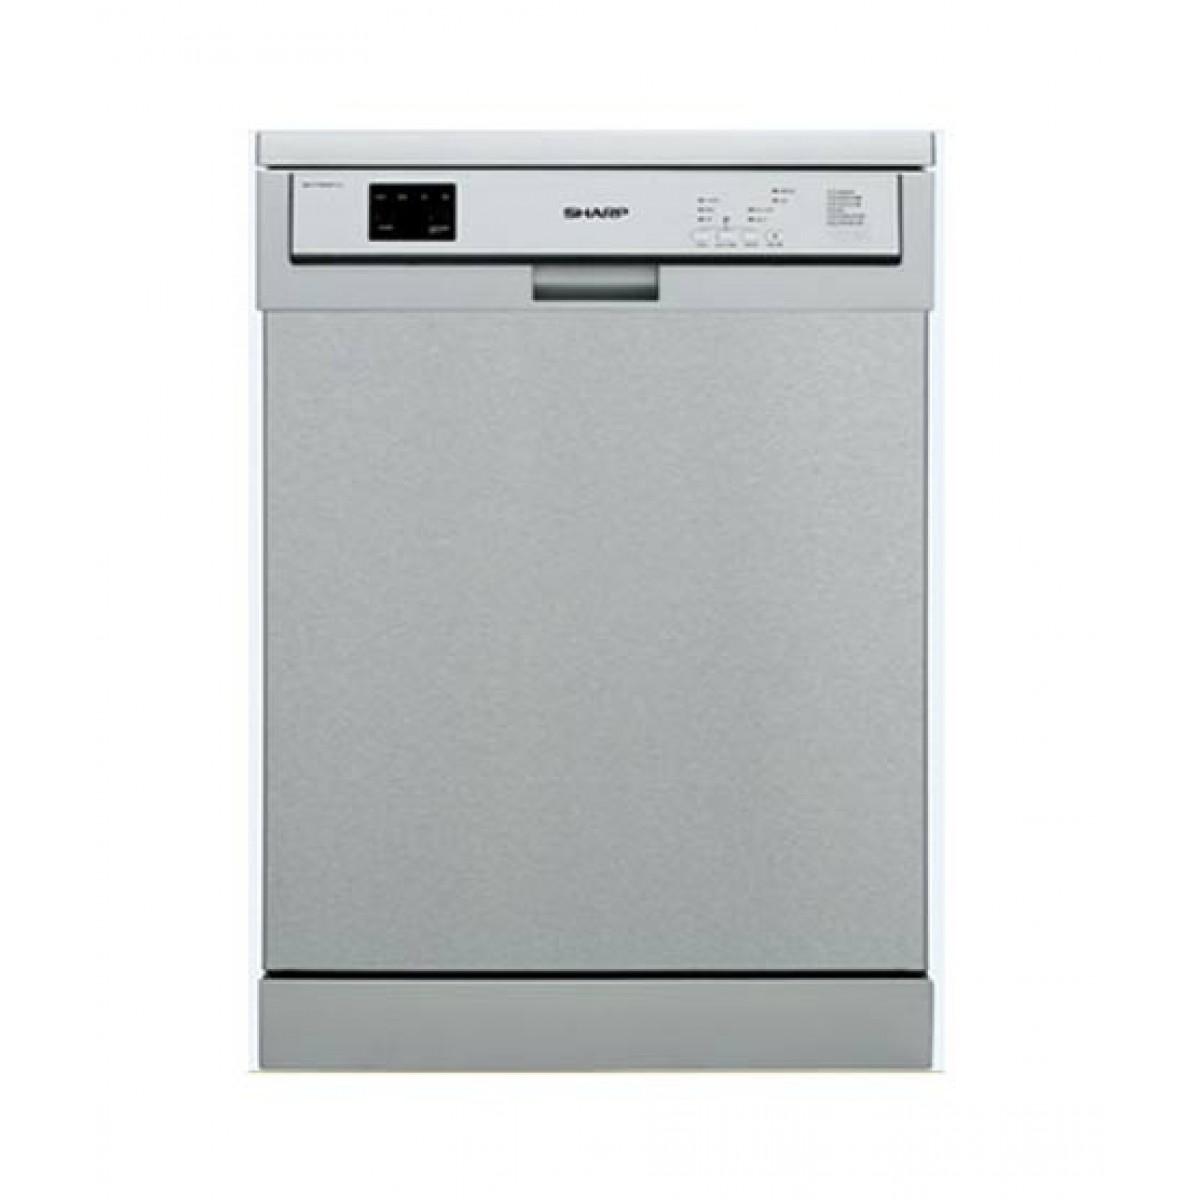 Sharp Dishwasher (QW-V615-SS2)